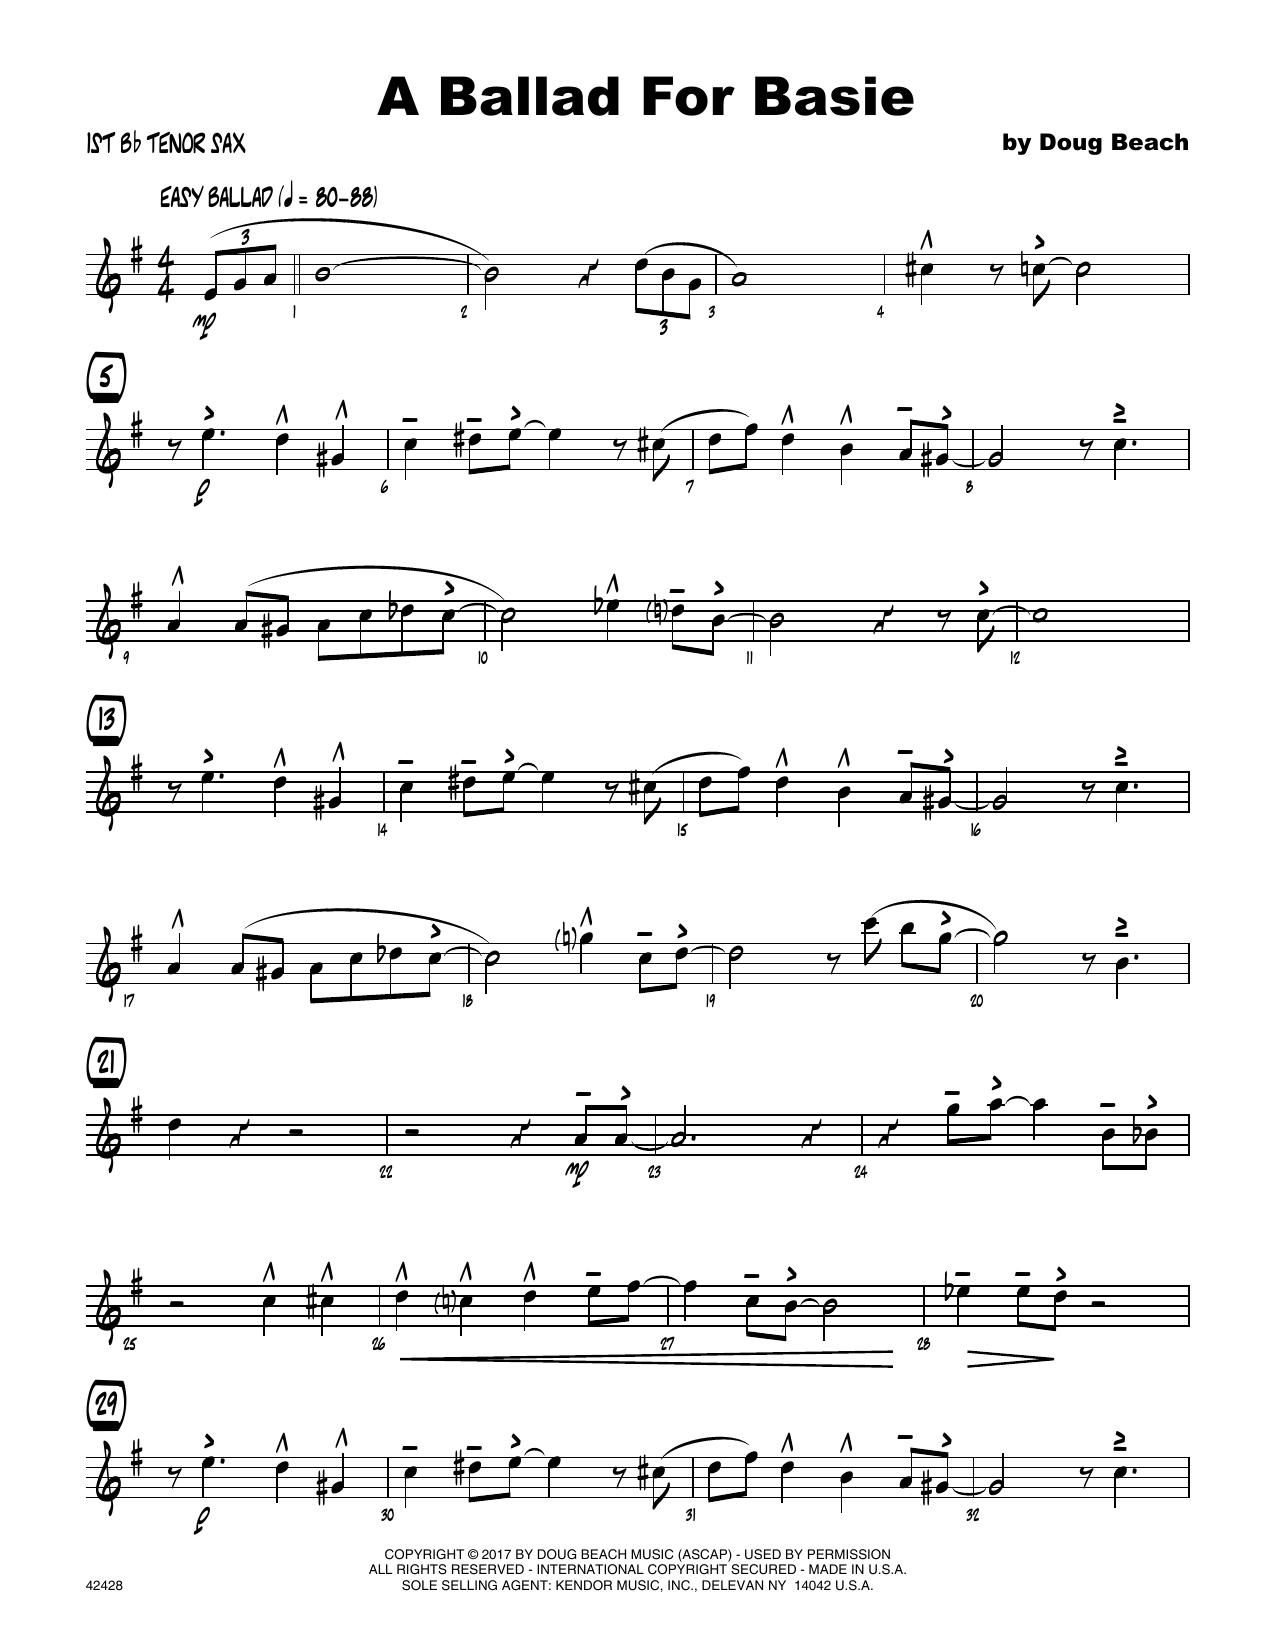 A Ballad For Basie - 1st Tenor Saxophone Sheet Music